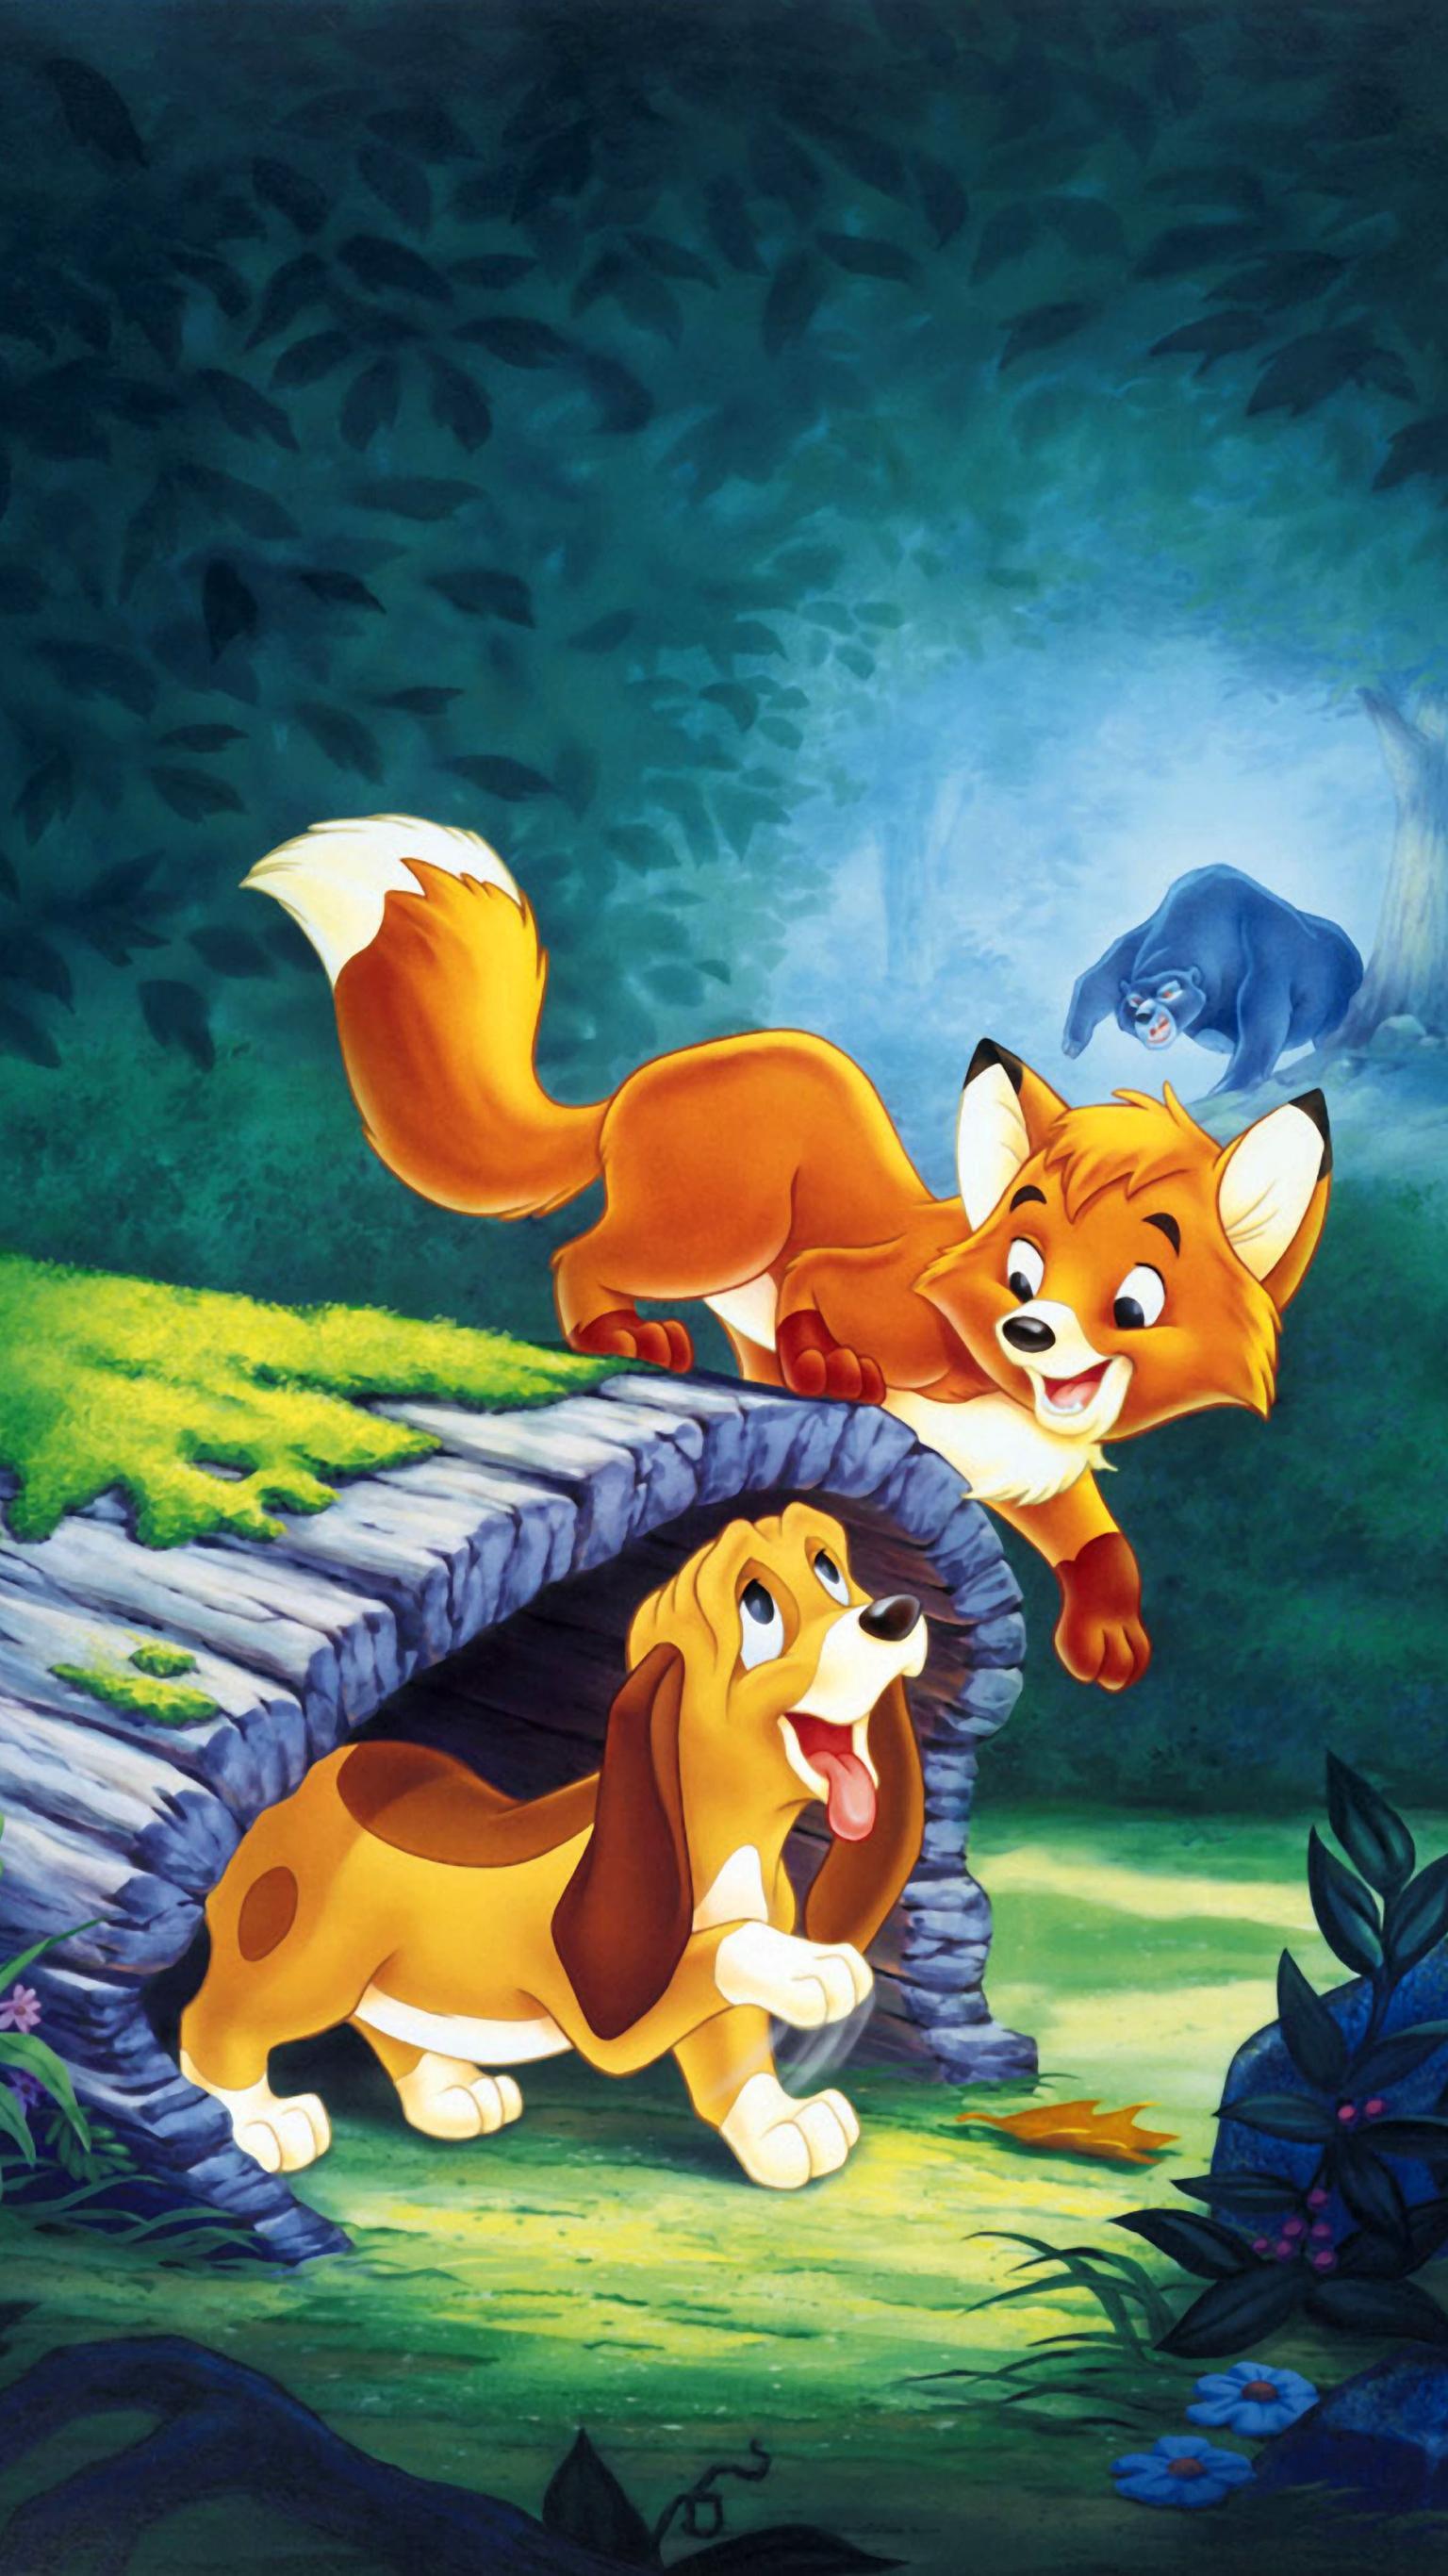 Cartoon Fox Wallpapers Top Free Cartoon Fox Backgrounds